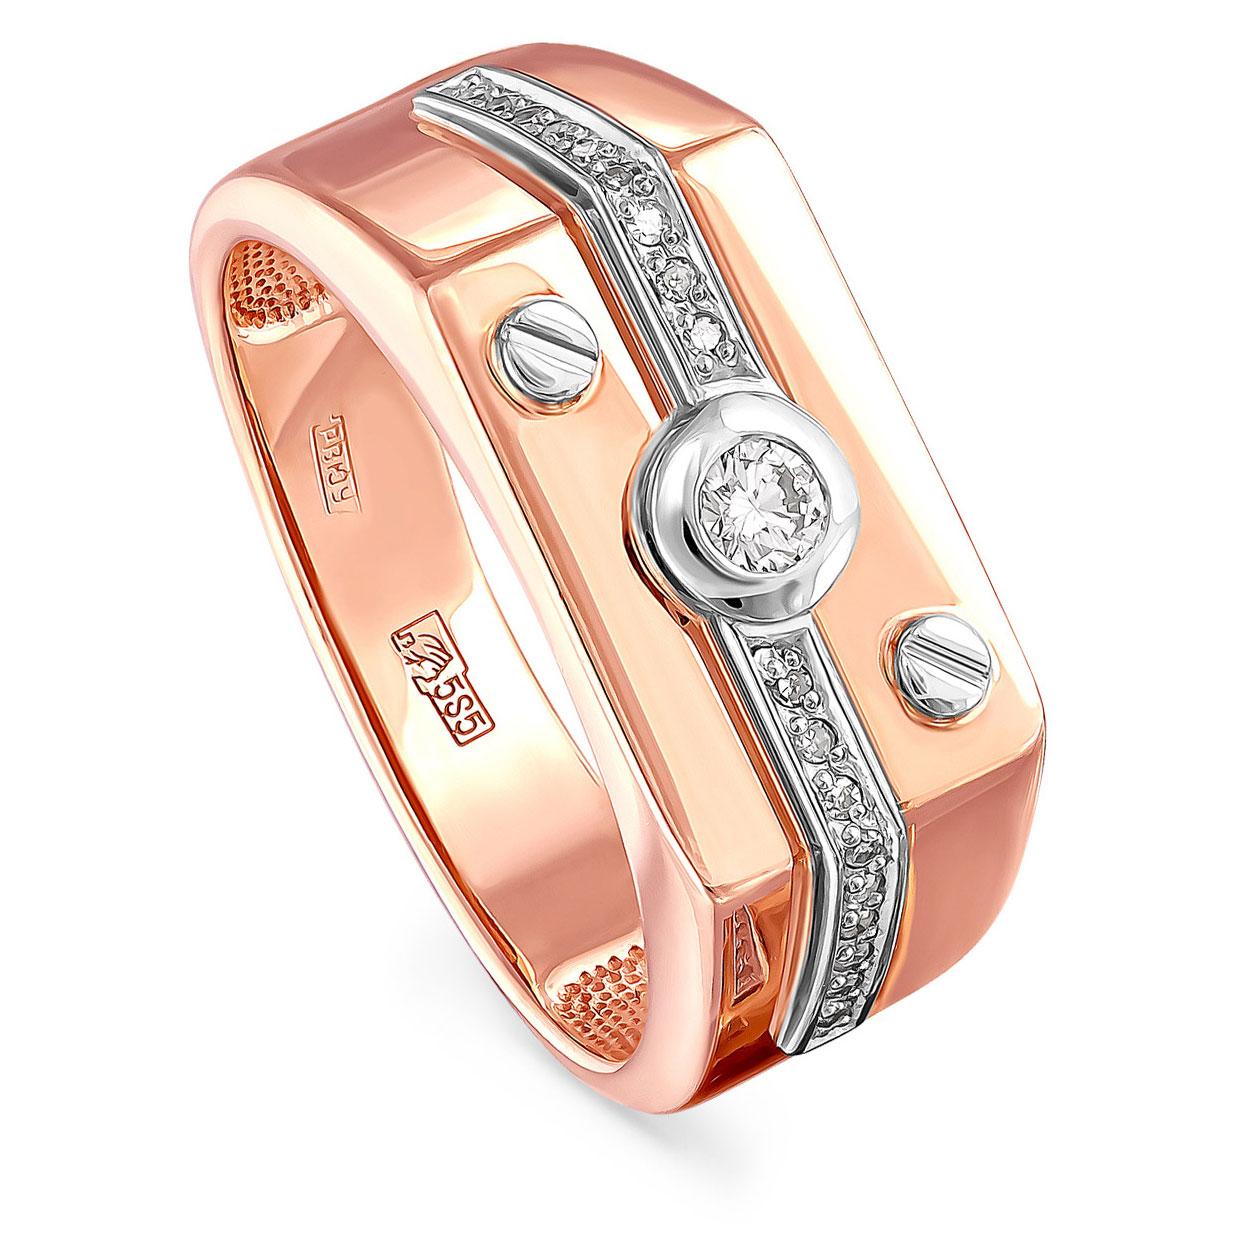 Золотое кольцо Бриллиант арт. 1-0289-1000 1-0289-1000